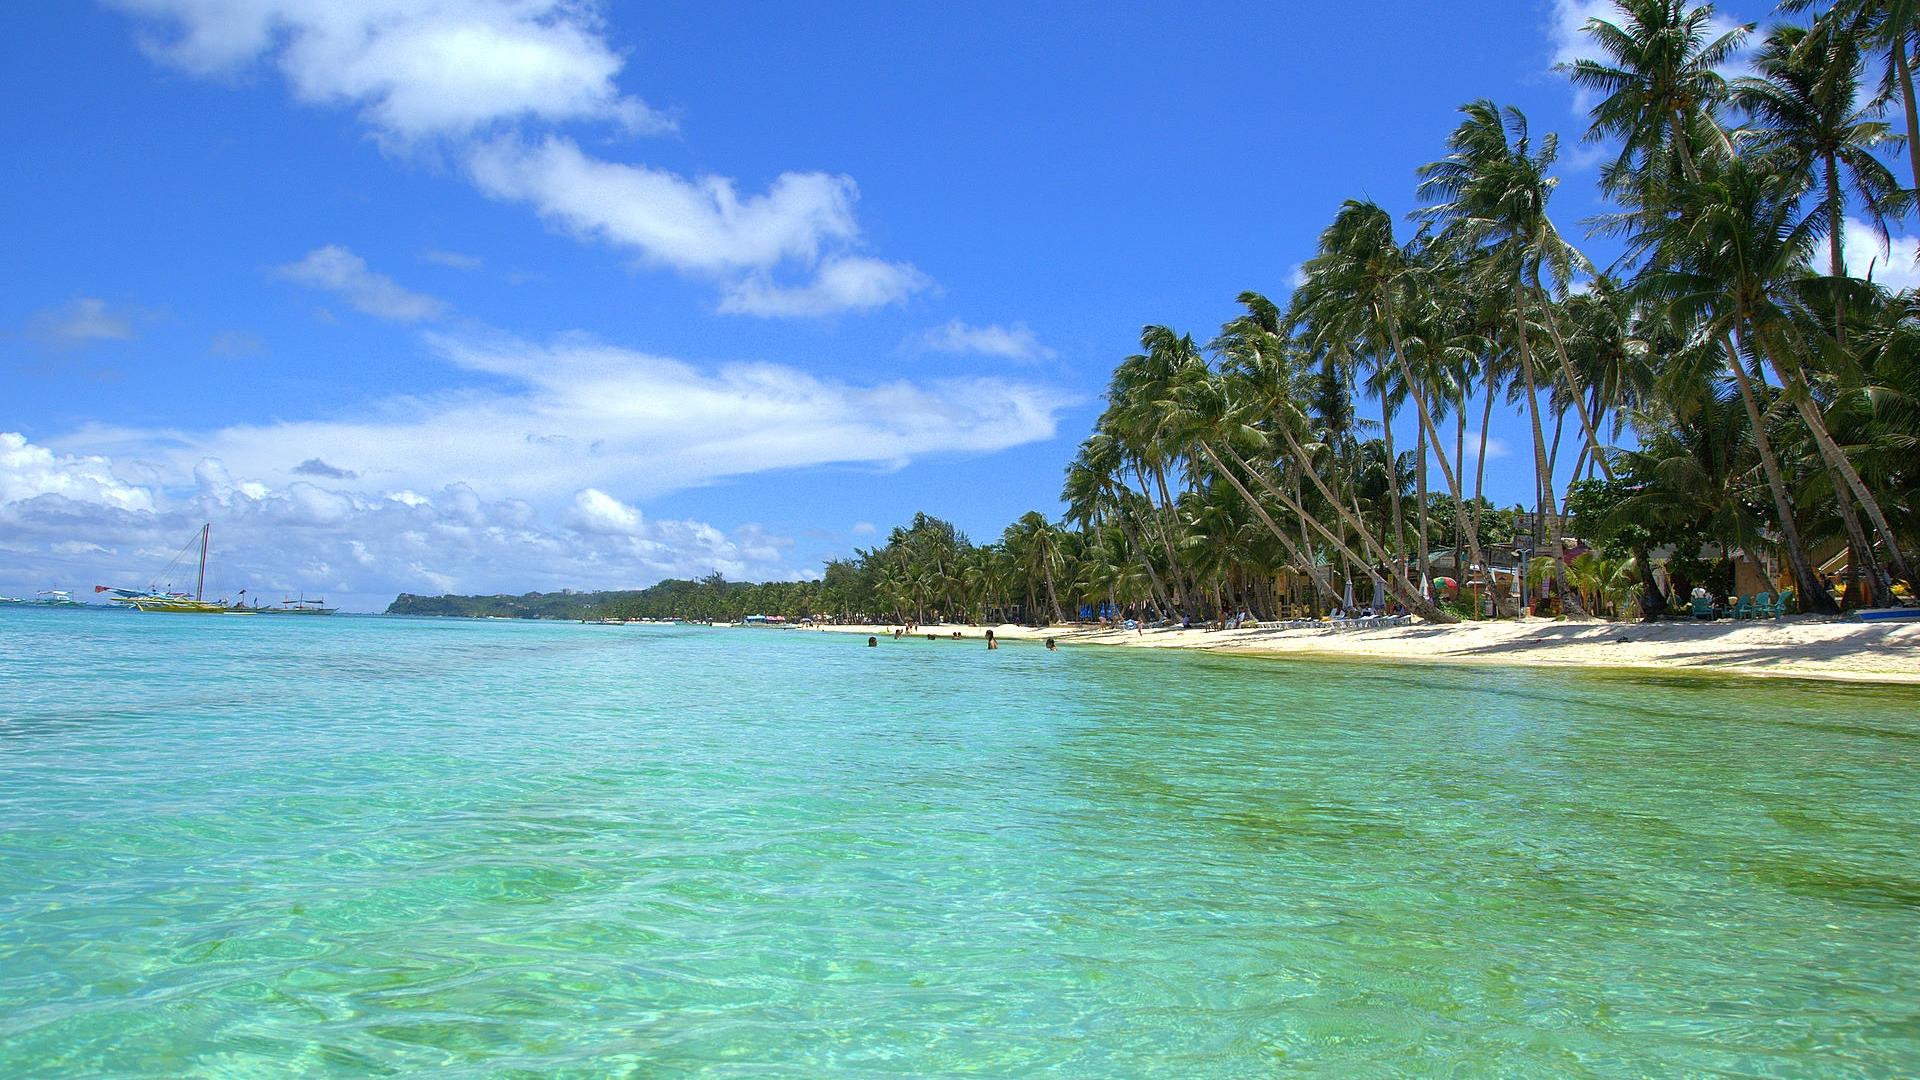 Free Tropical Desktop Wallpaper | Download HD Wallpapers